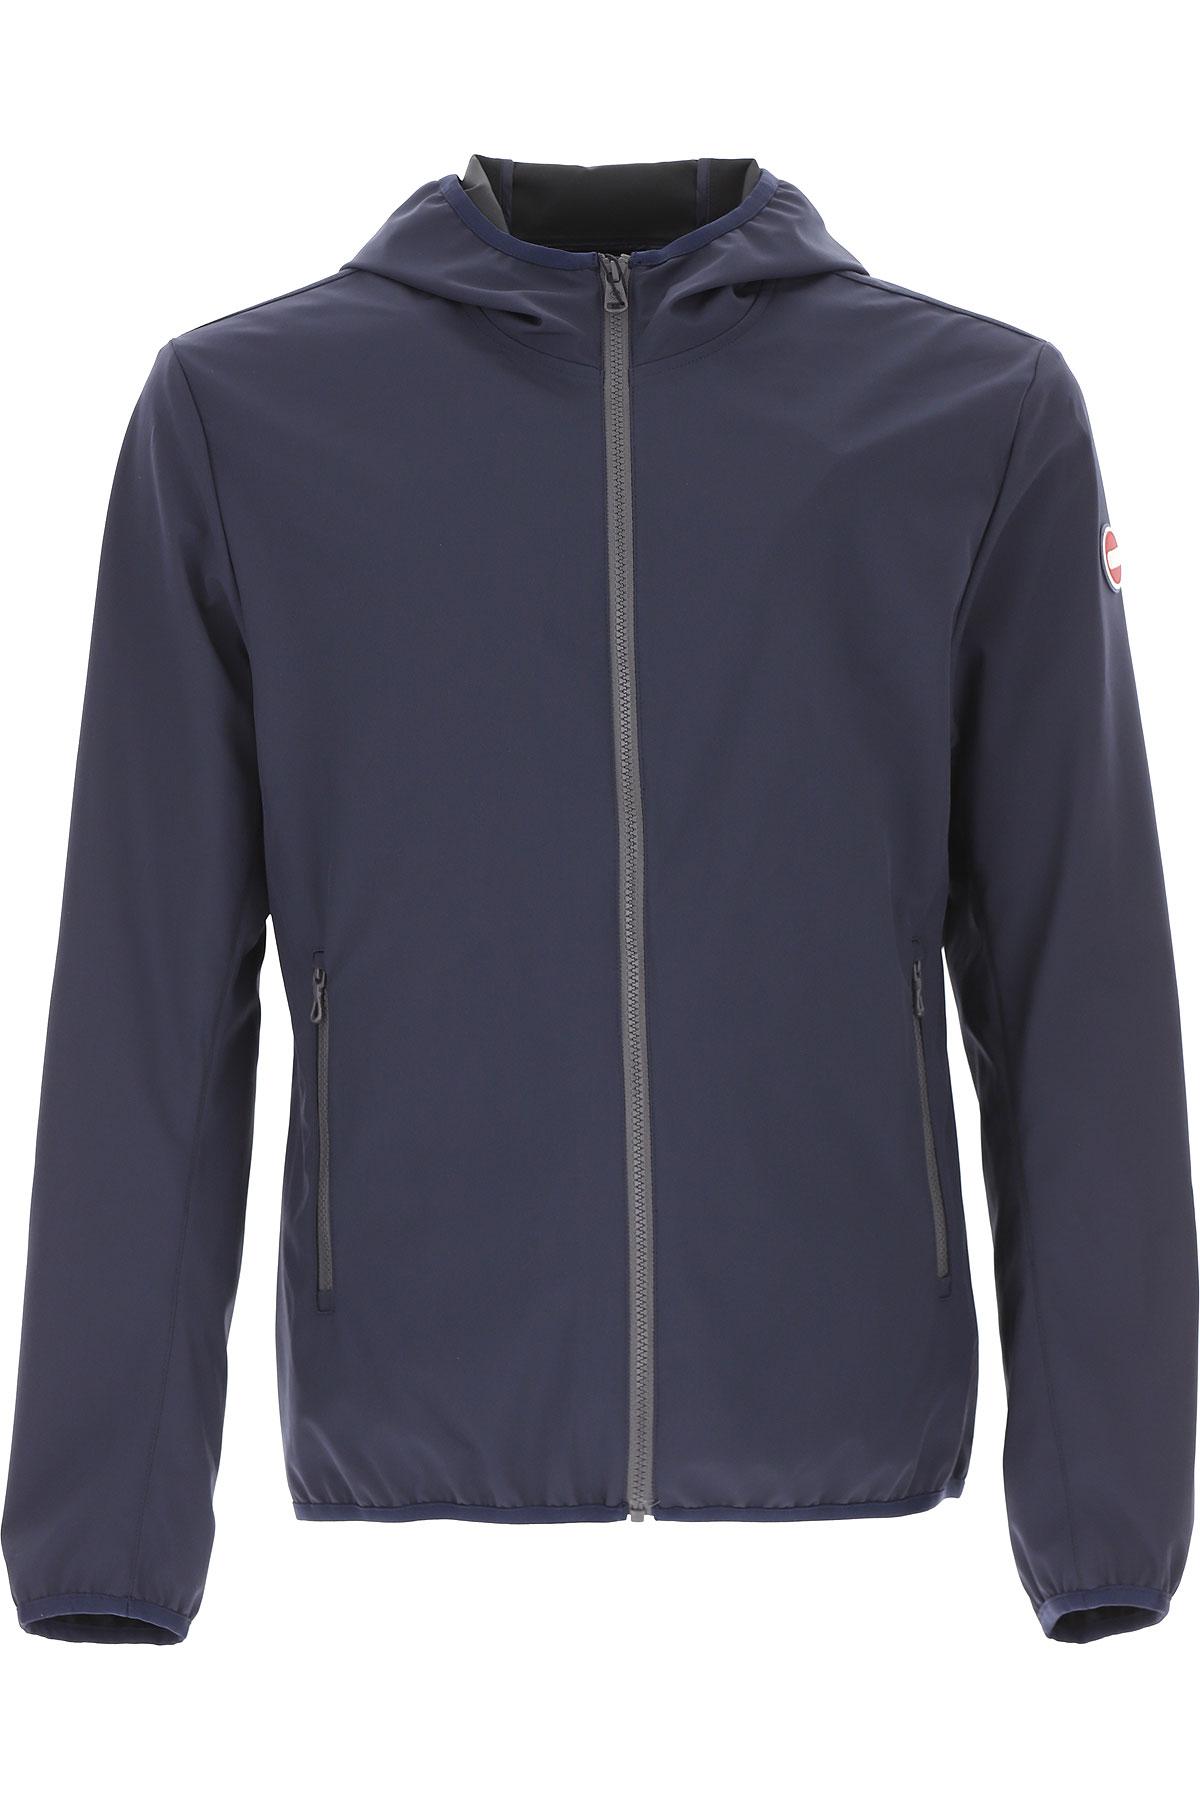 Colmar Jacket for Men On Sale, Navy Blue, polyester, 2019, L S XL XXL